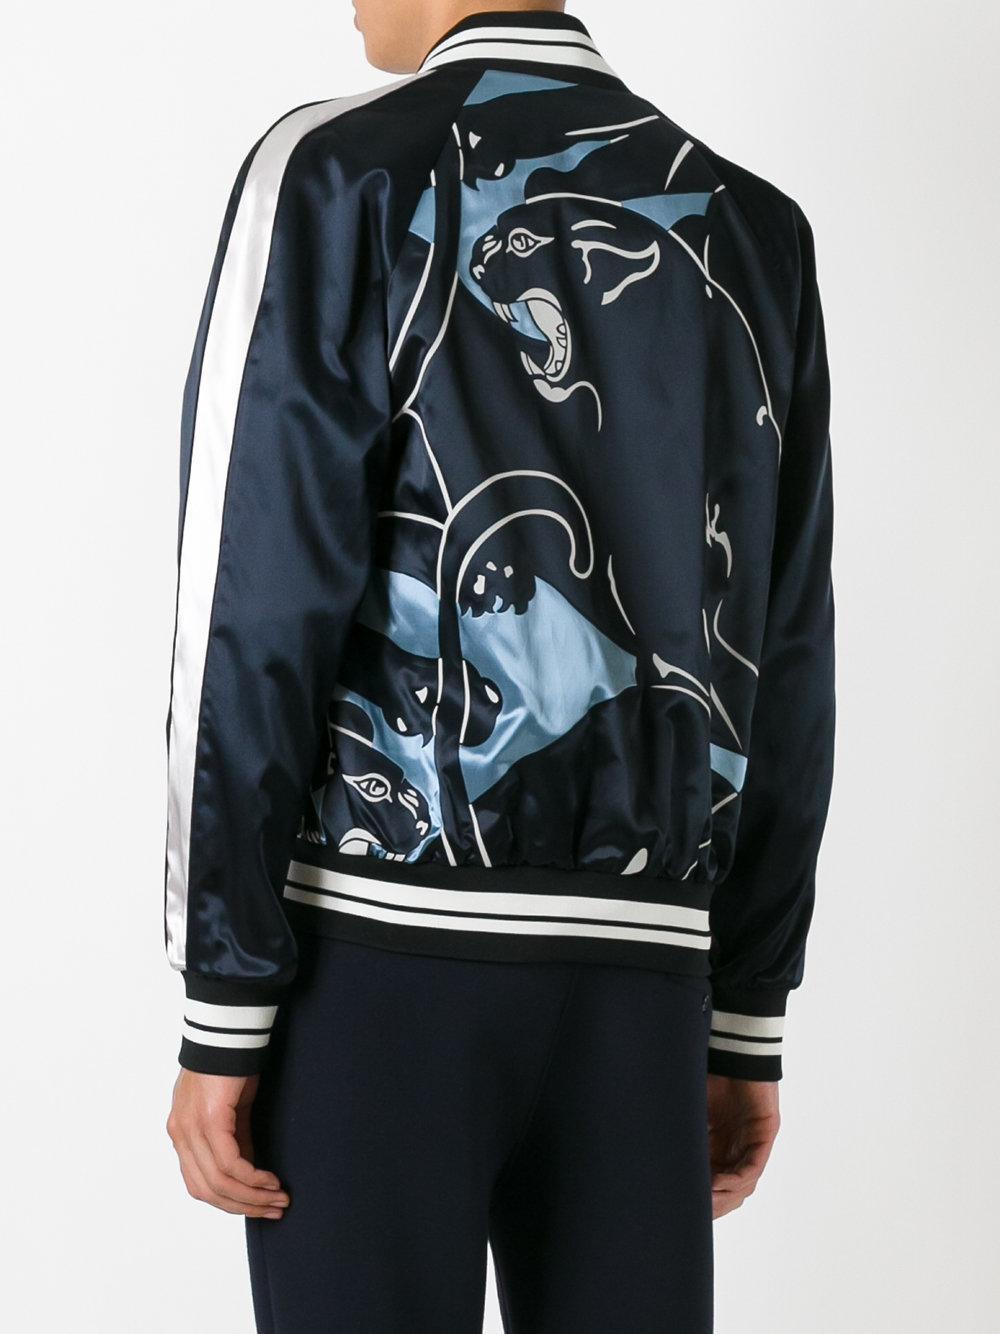 Valentino Lion Print Bomber Jacket In Black For Men Lyst